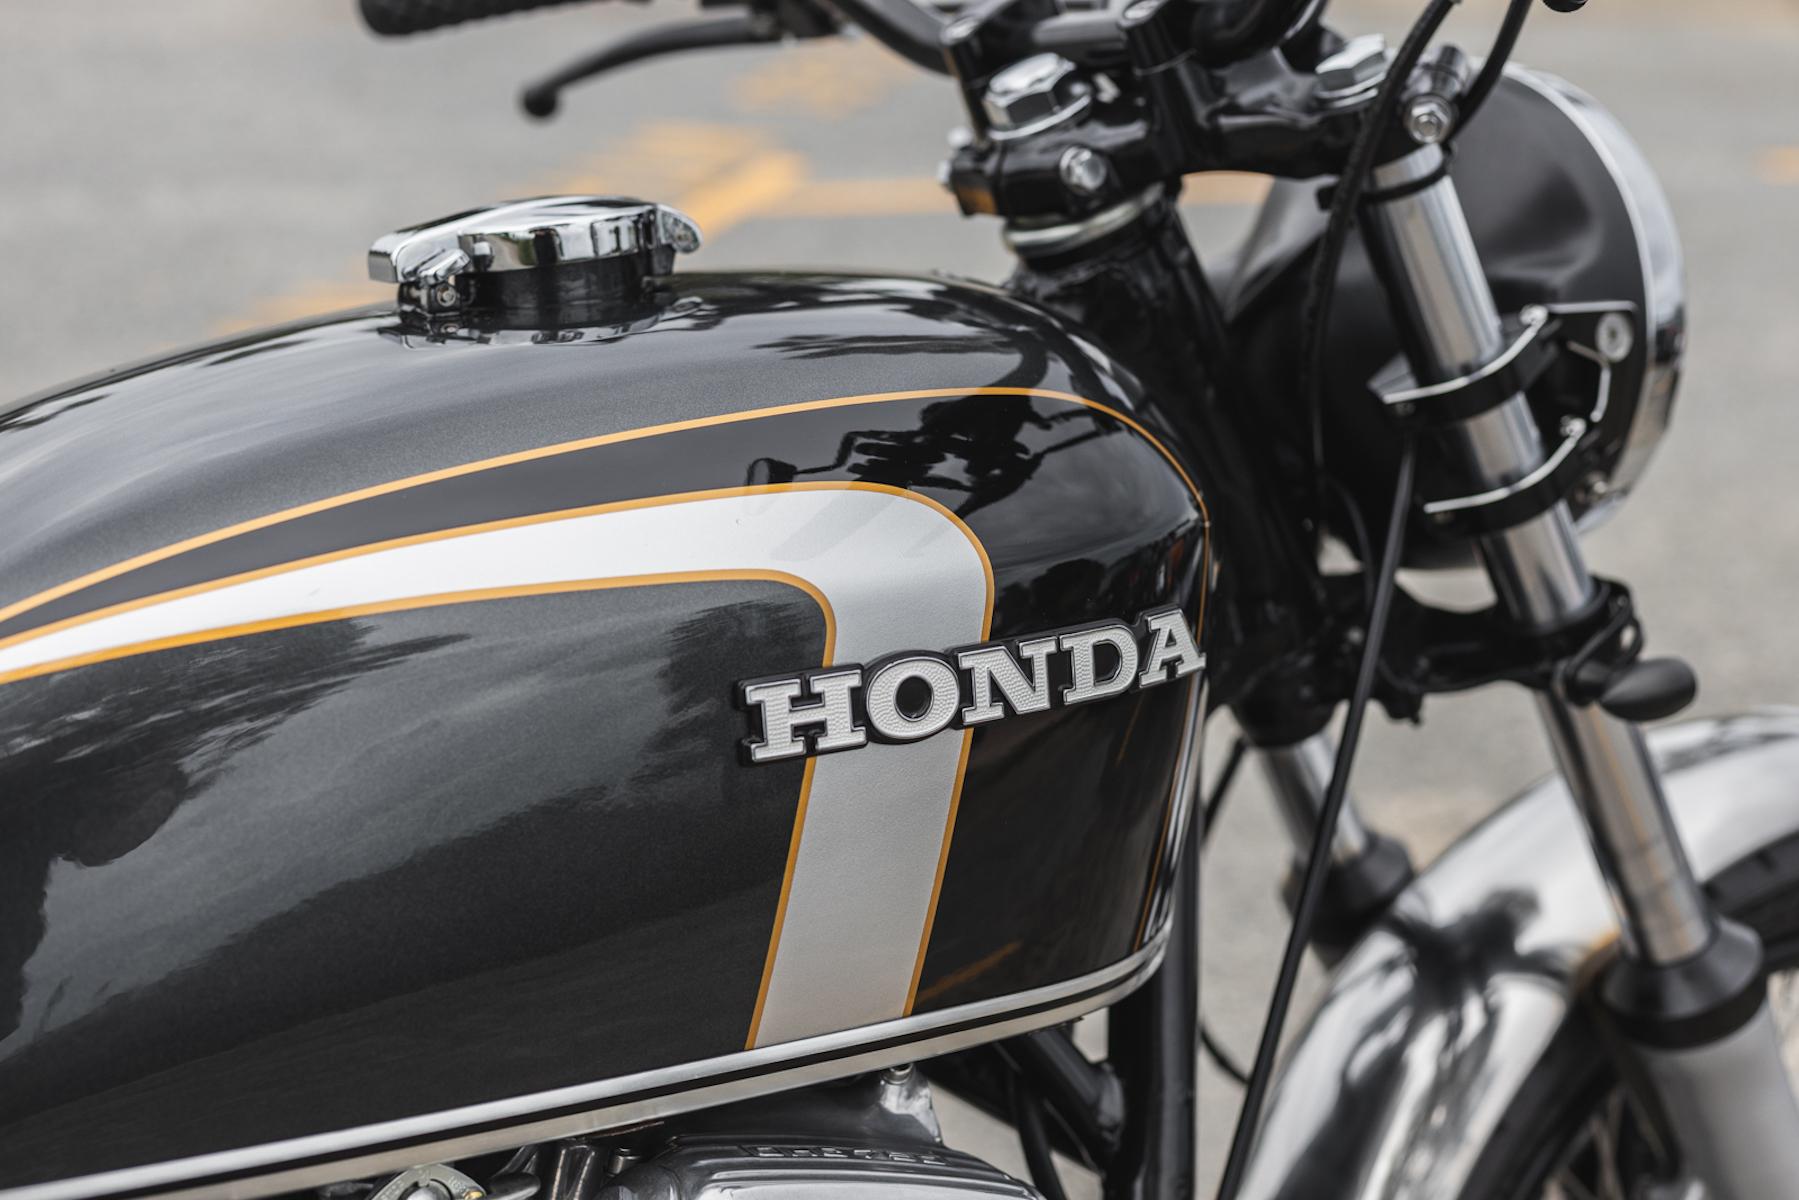 A close-up of a Honda CB750